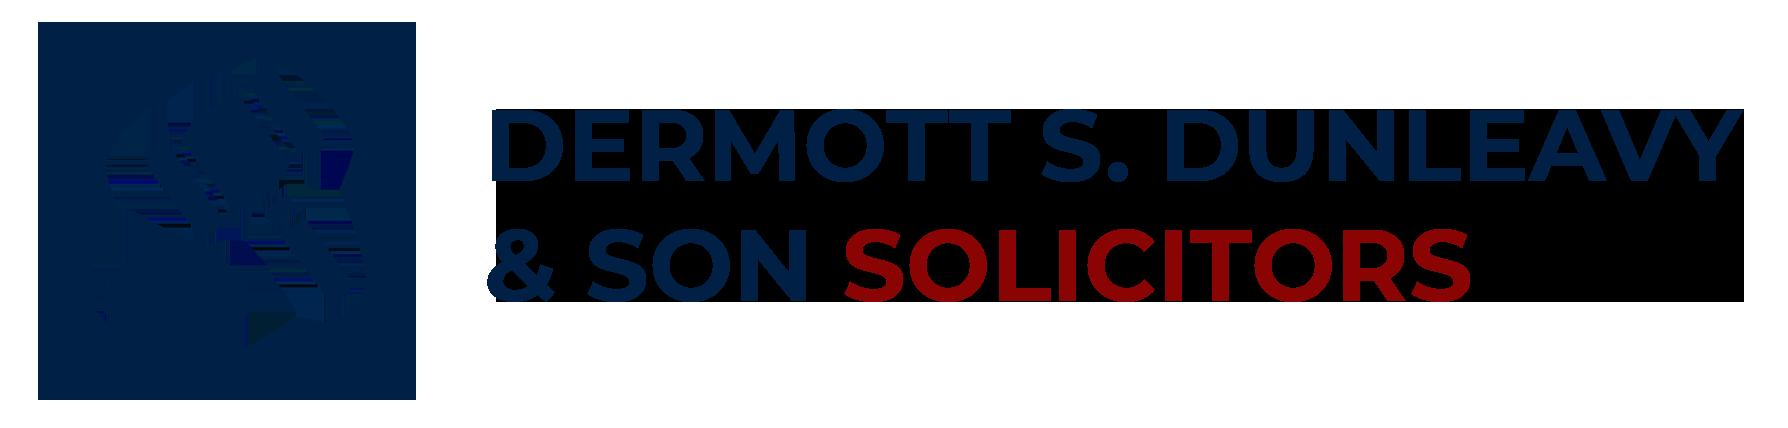 The Dermott S. Dunleavy & Son Solicitors Logo